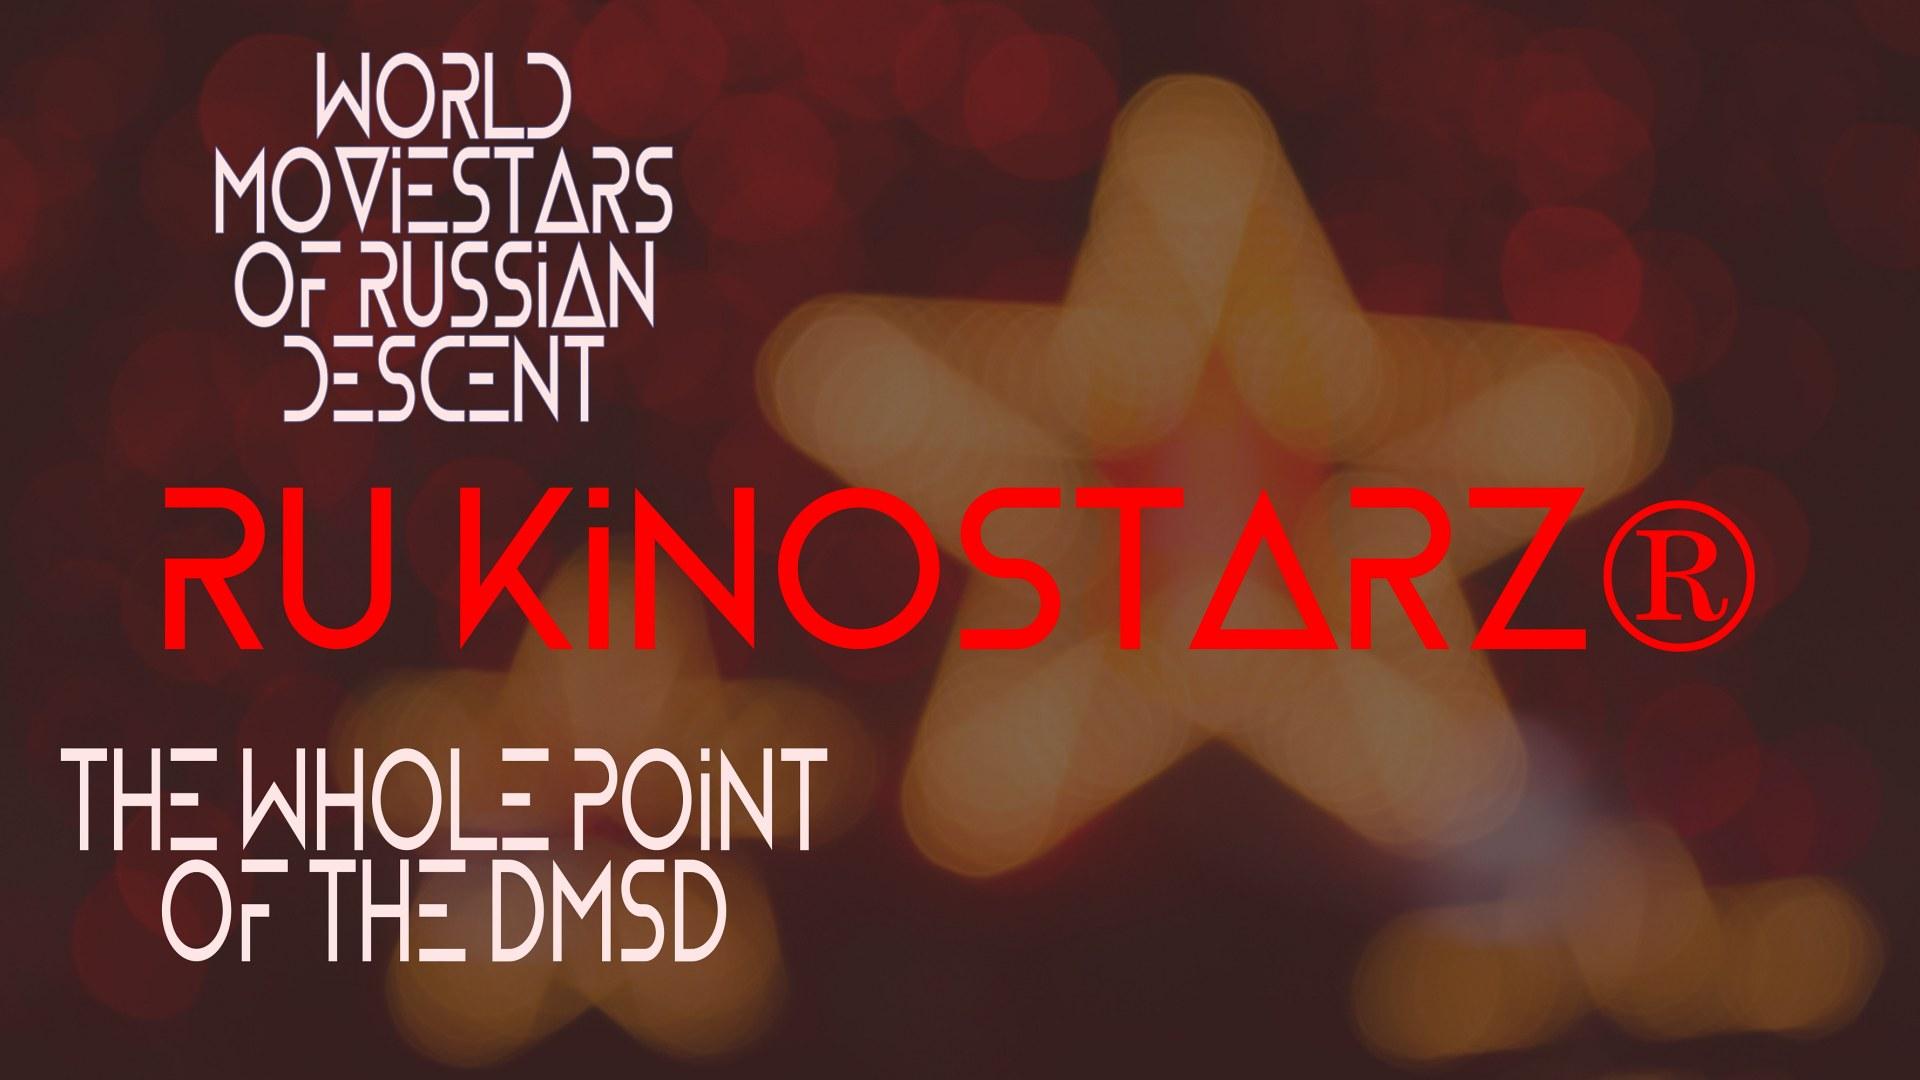 RU KinoStarz on DMSD